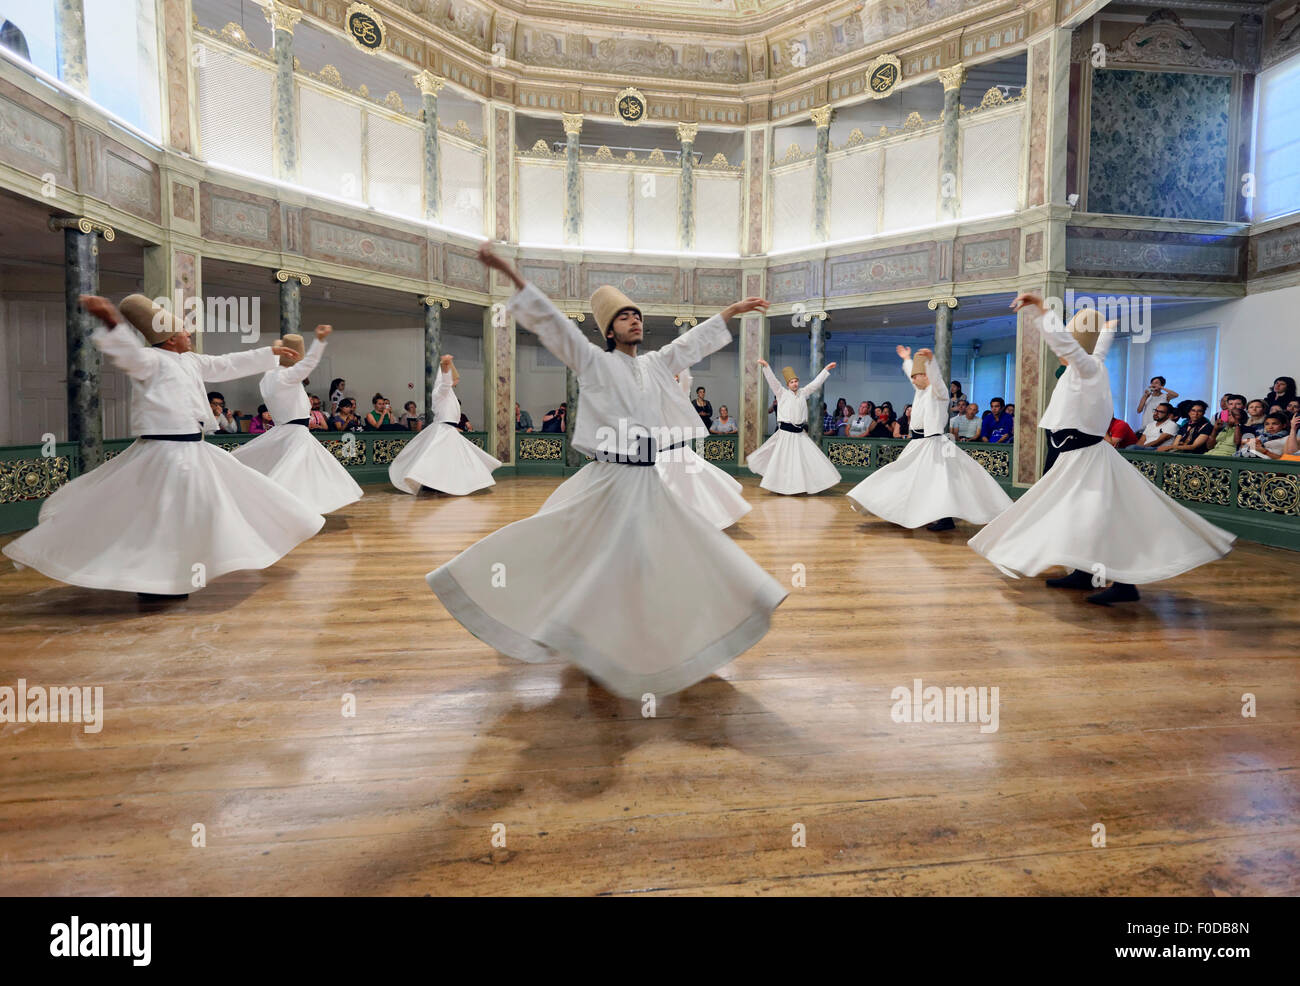 Whirling Dervishes, dervish Sema dance, Mevlevihanesi Müzesi, Istiklal Caddesi, Istanbul, European side, Turkey - Stock Image